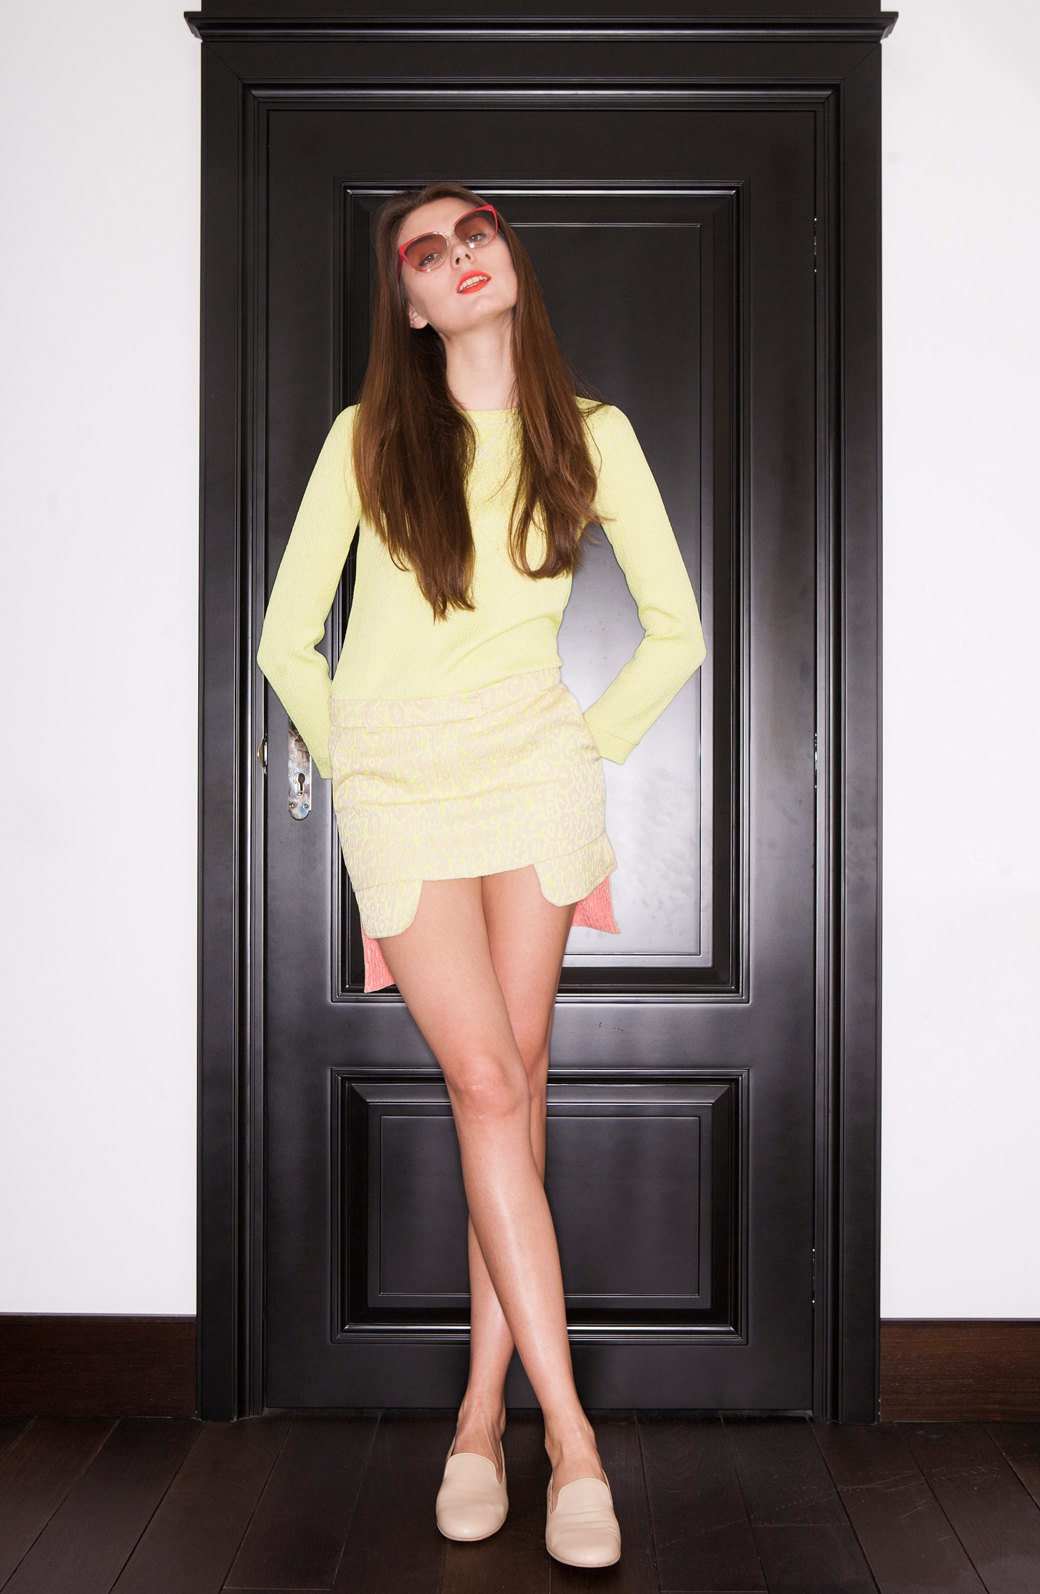 Дарья Самкович,  дизайнер марки I AM. Изображение № 25.